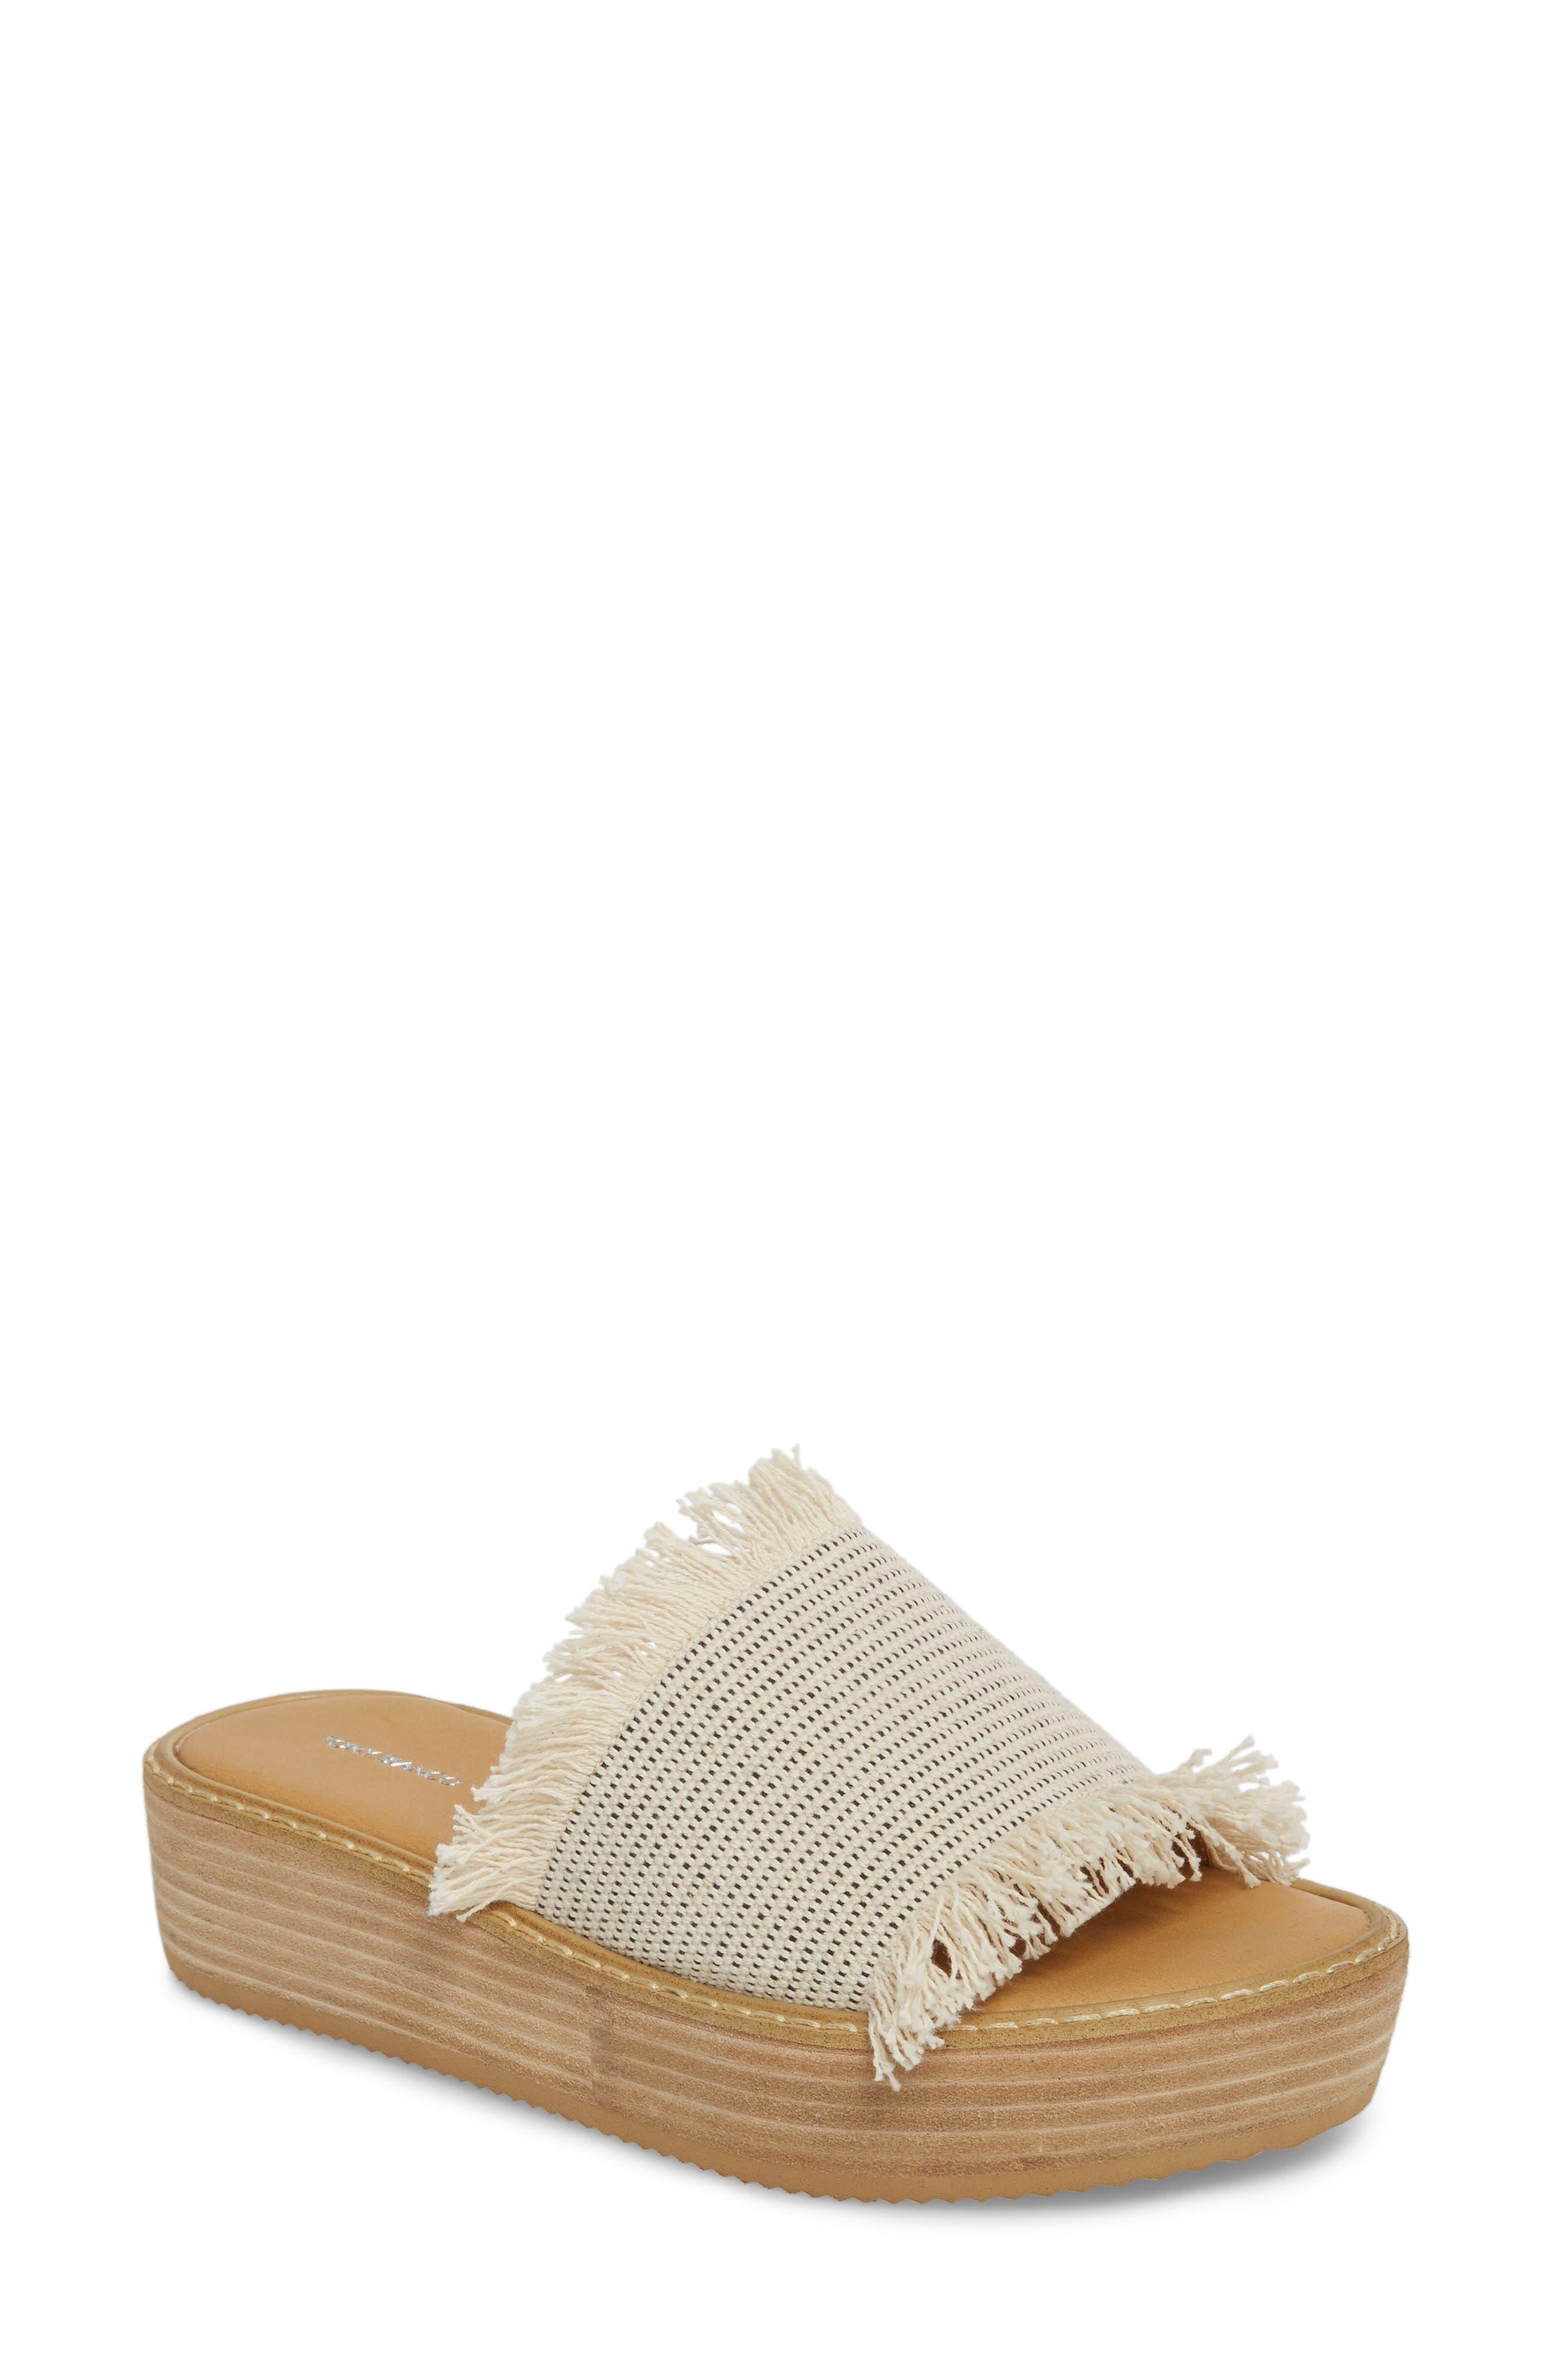 Ebony Platform Sandal,                             Main thumbnail 1, color,                             100